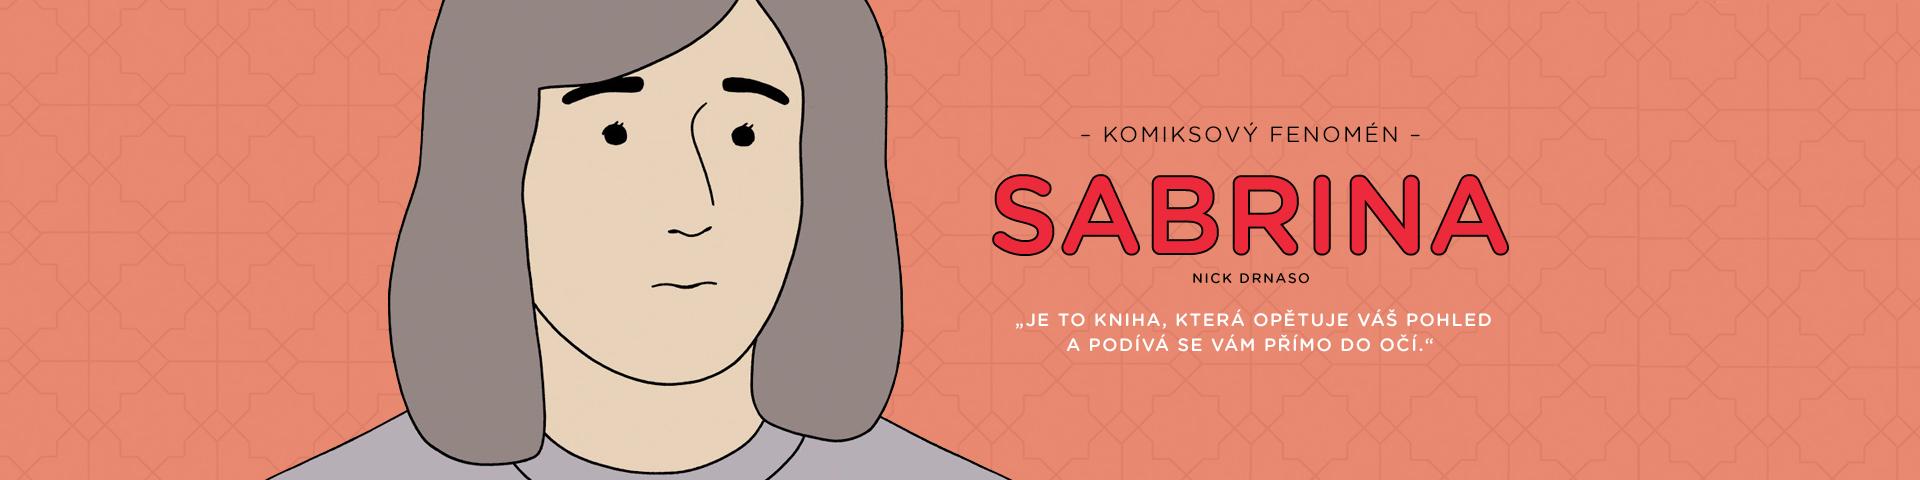 sabrina_carousel